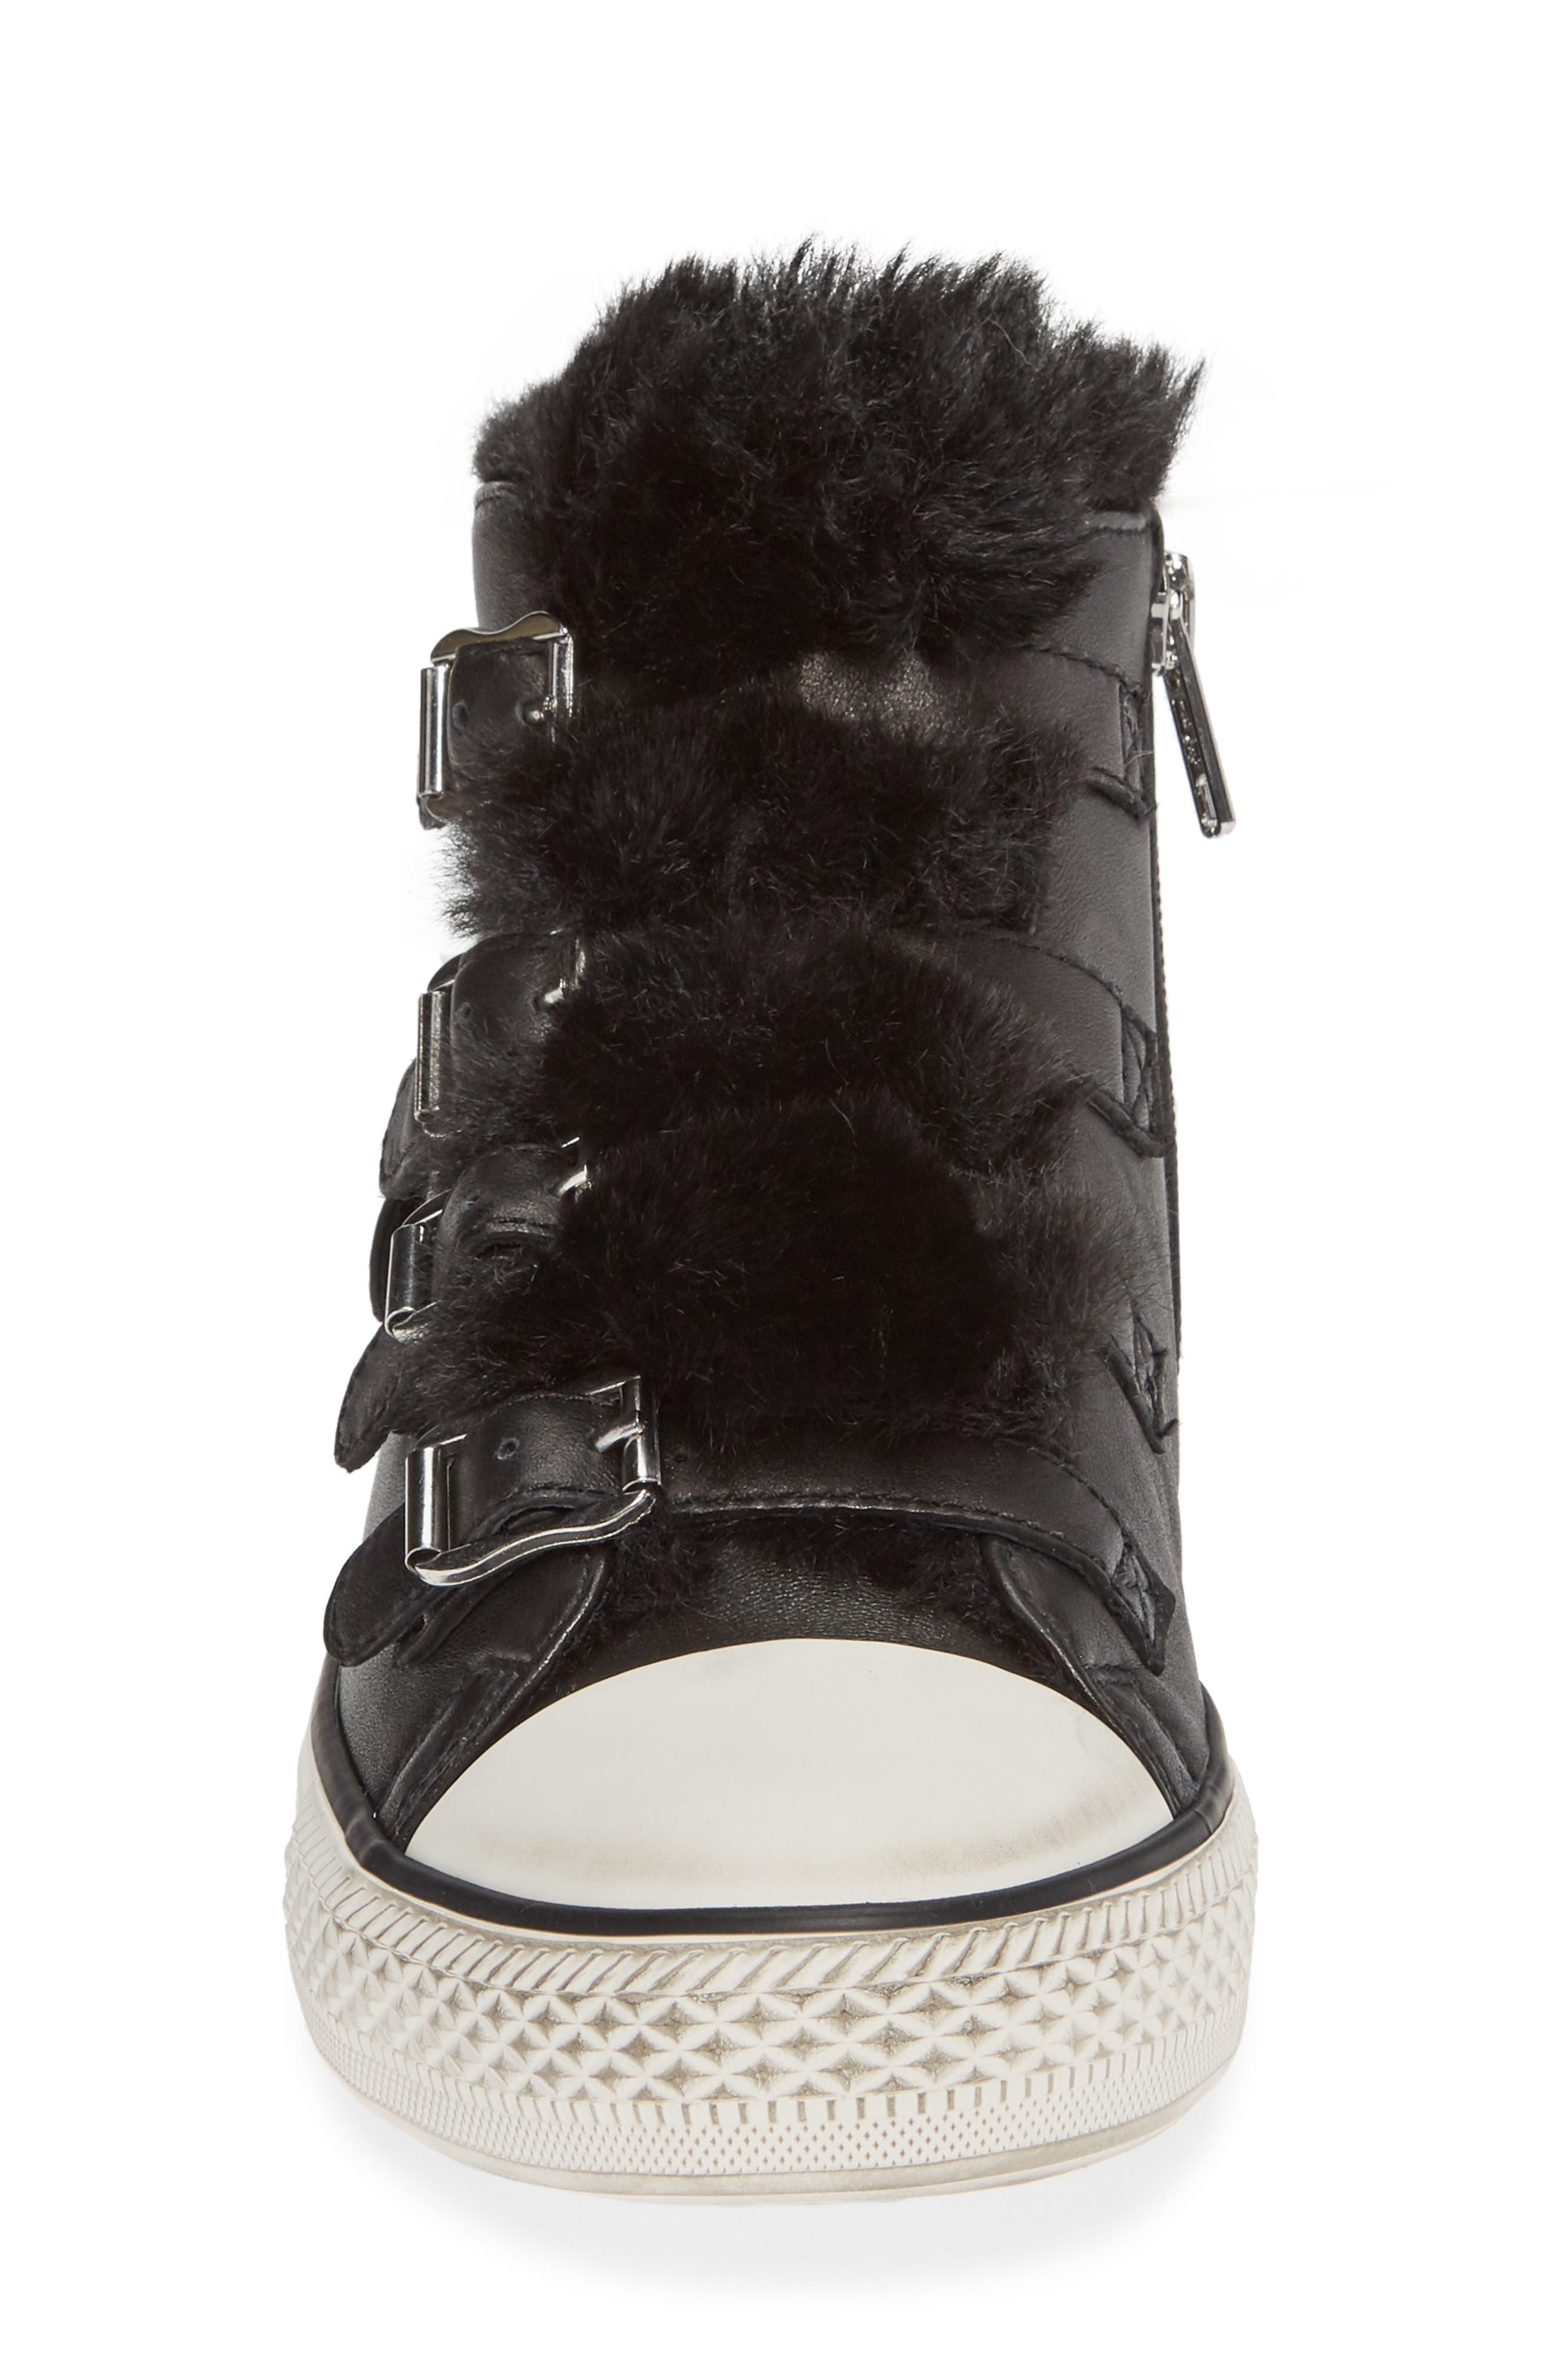 ASH, Valko High Top Sneaker, Alternate thumbnail 4, color, BLACK/ BLACK FAUX FUR